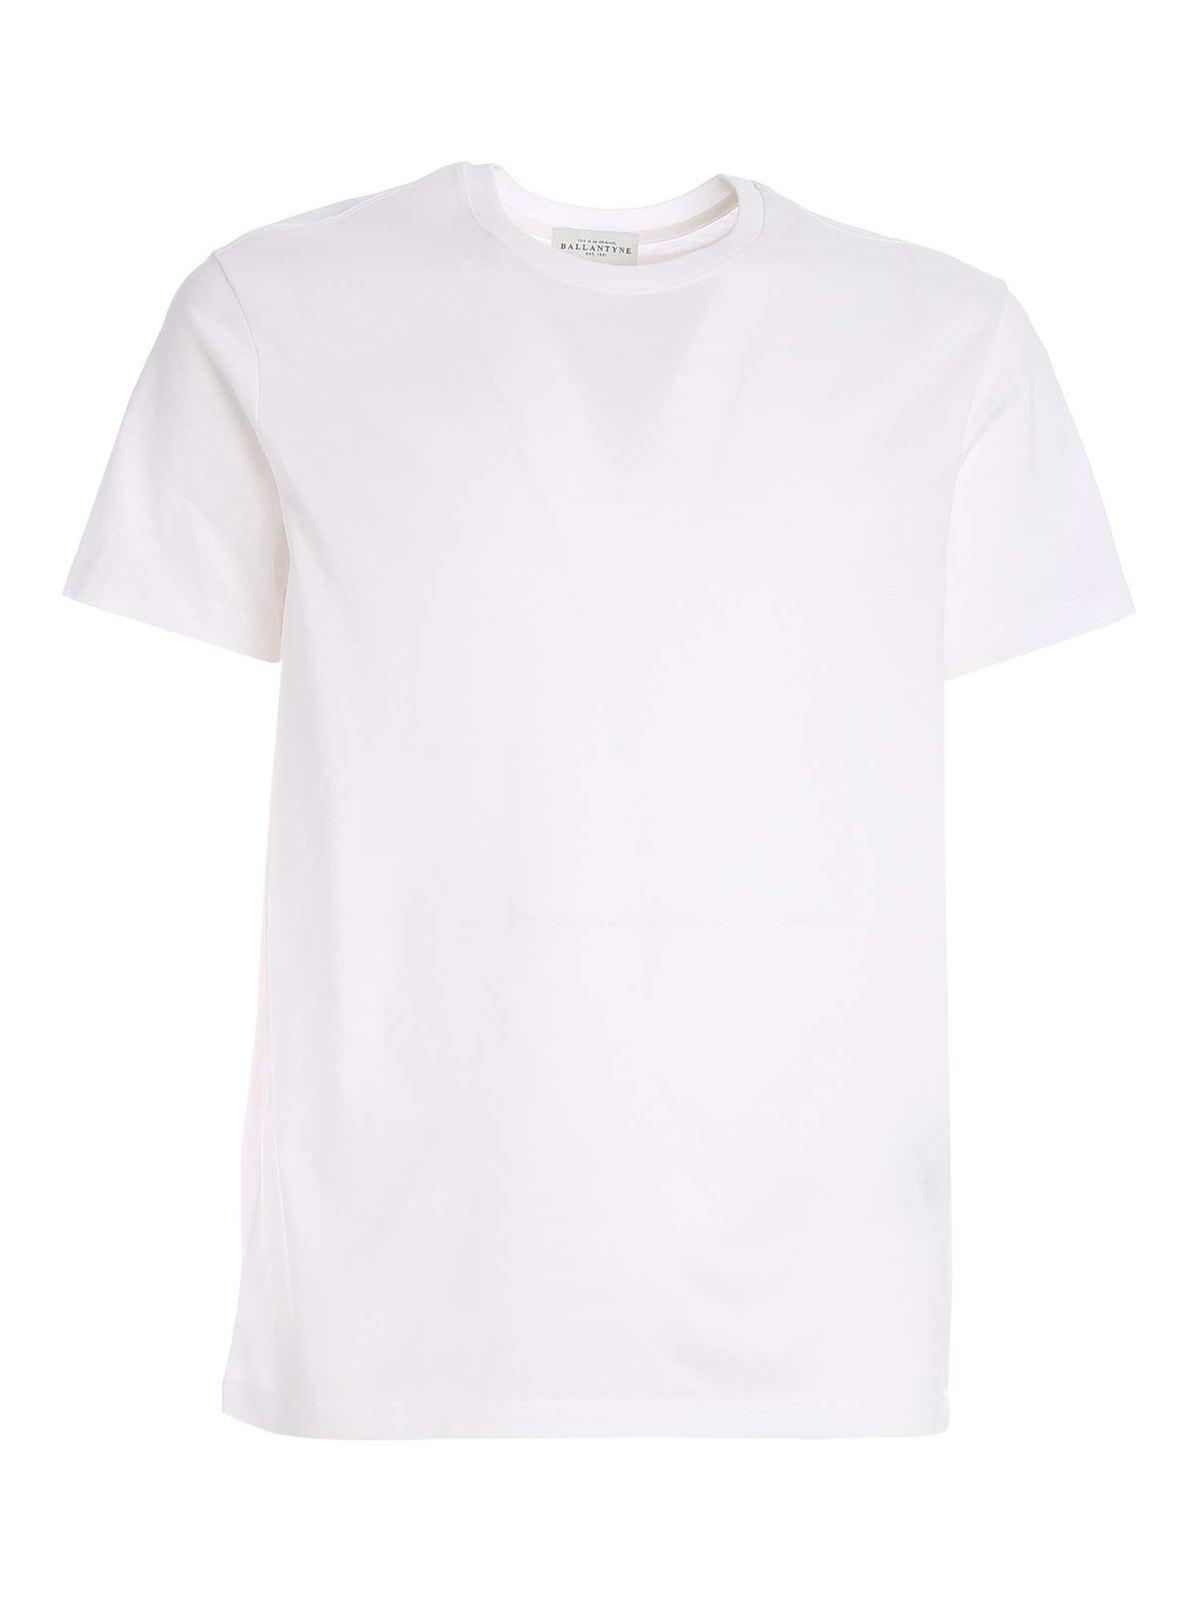 Ballantyne Cottons BASIC T-SHIRT IN WHITE